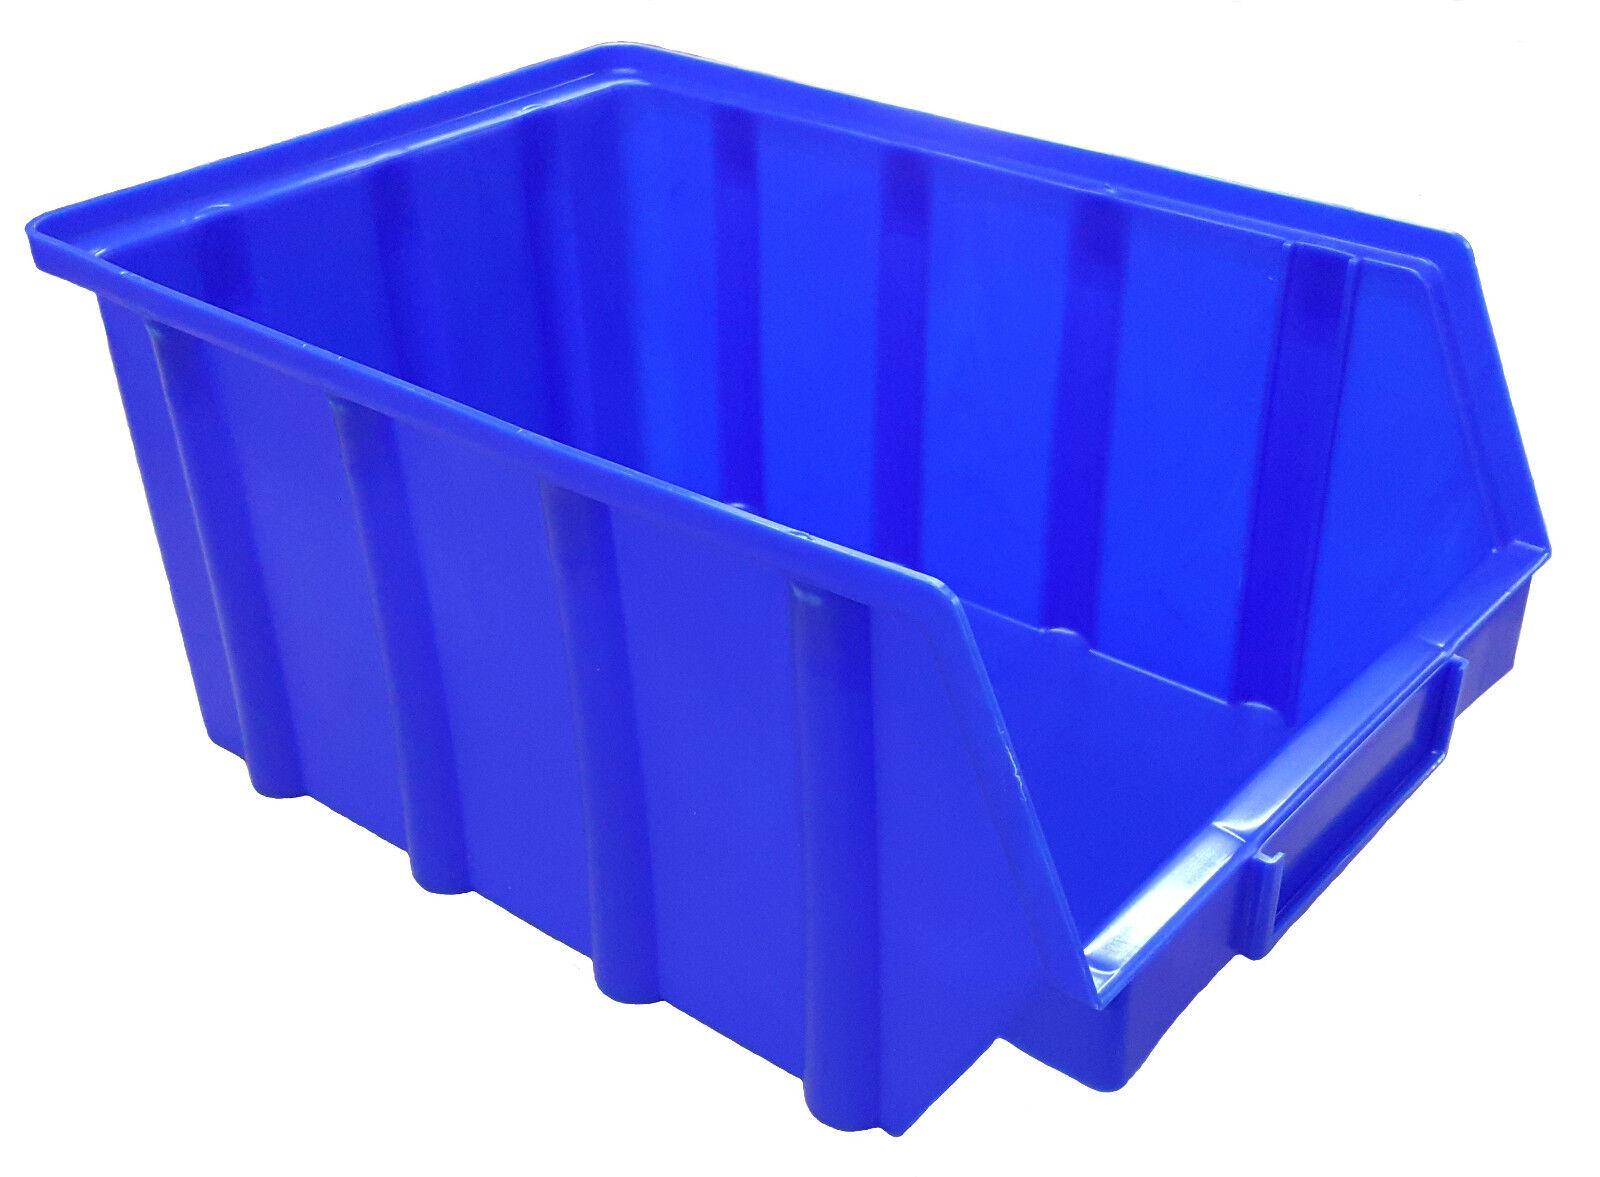 130 Stapelboxen Gr.4 Stapelkisten Kunststoff PP blau Lagerkisten Lagerboxen